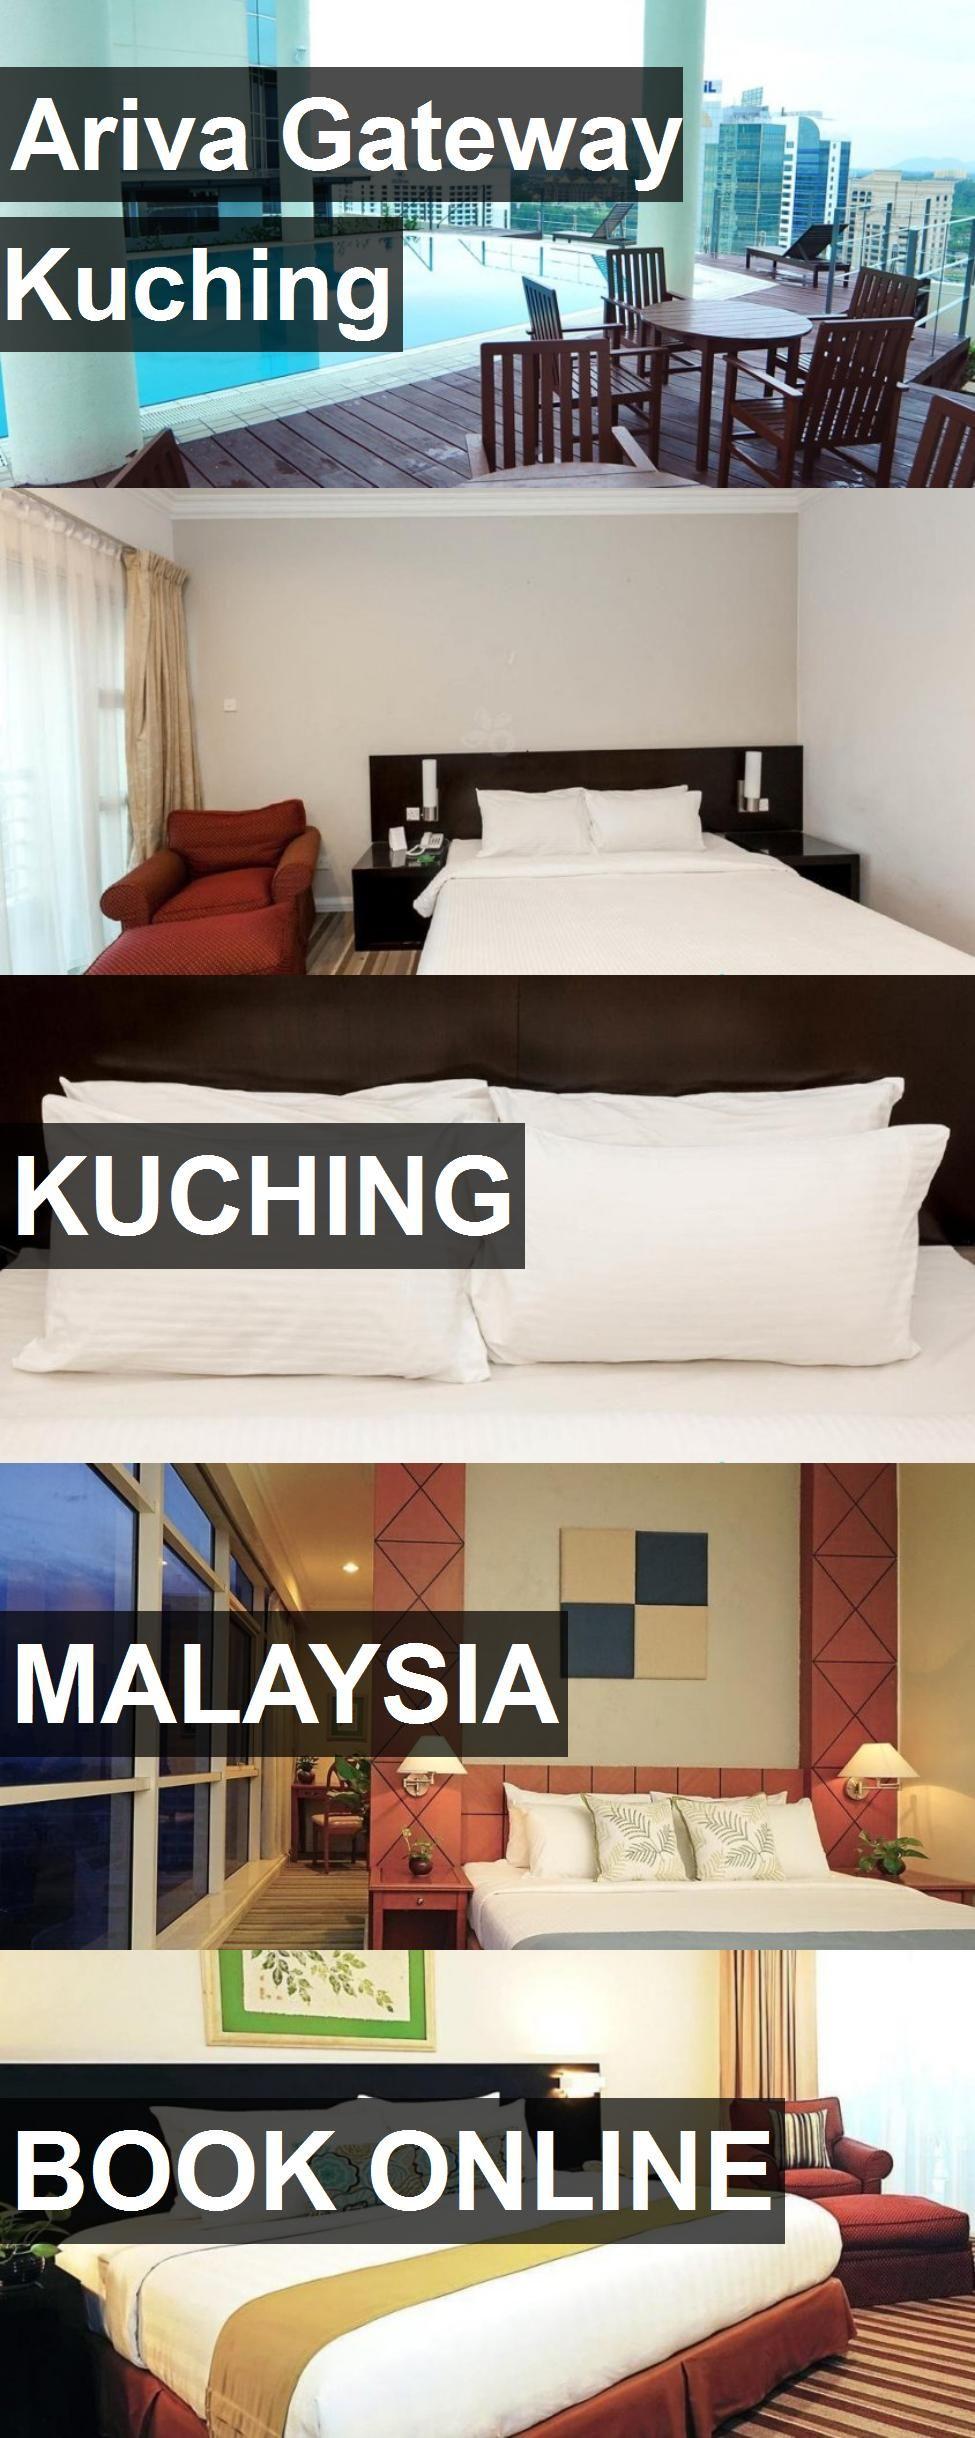 Hotel Ariva Gateway Kuching In Kuching, Malaysia. For More